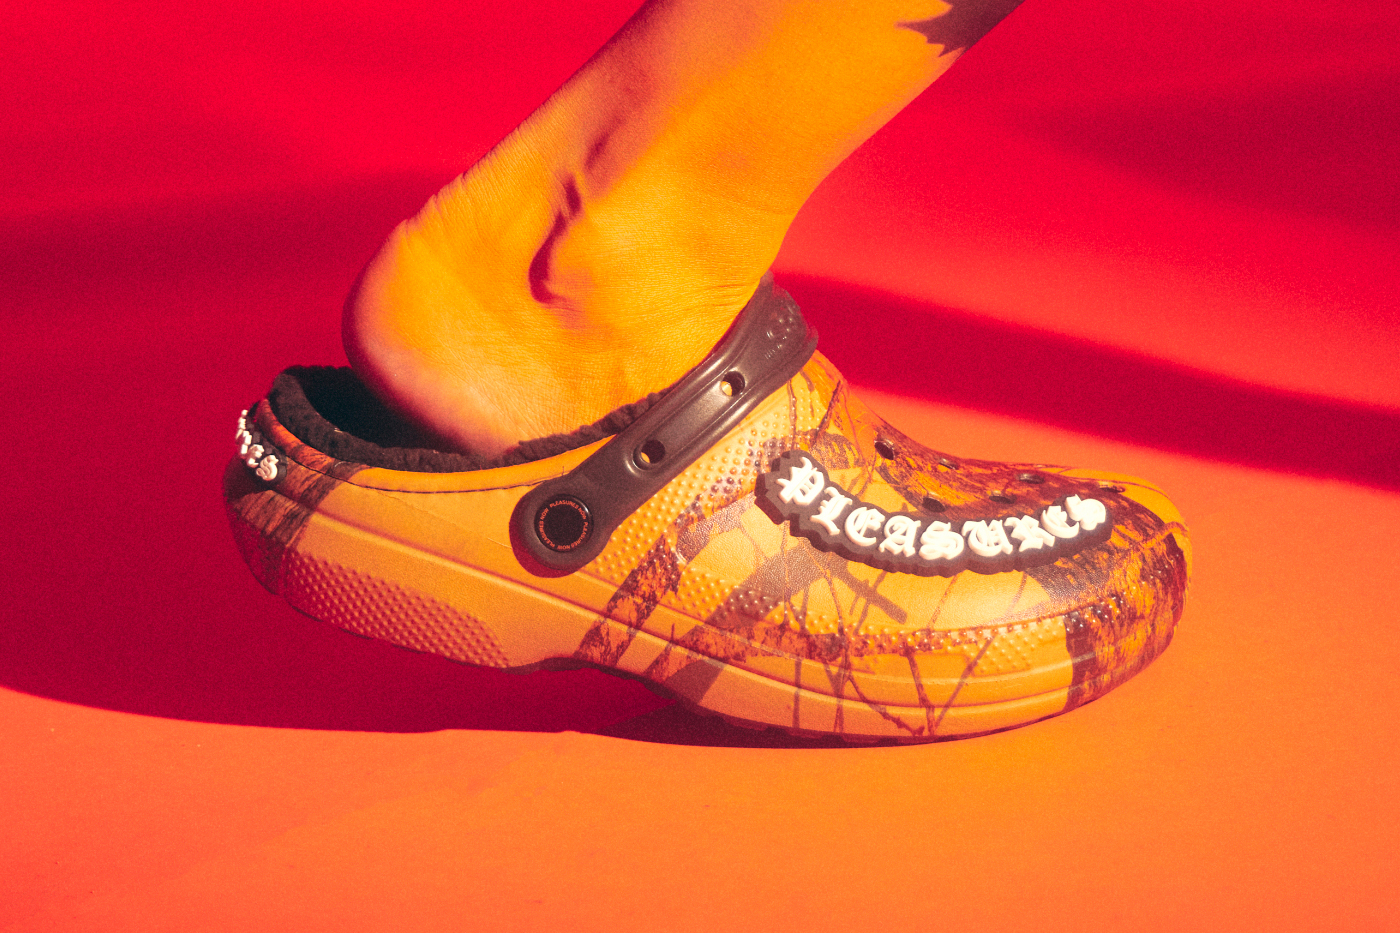 PLEASURES Re-Unite With Crocs for Camo Clogs